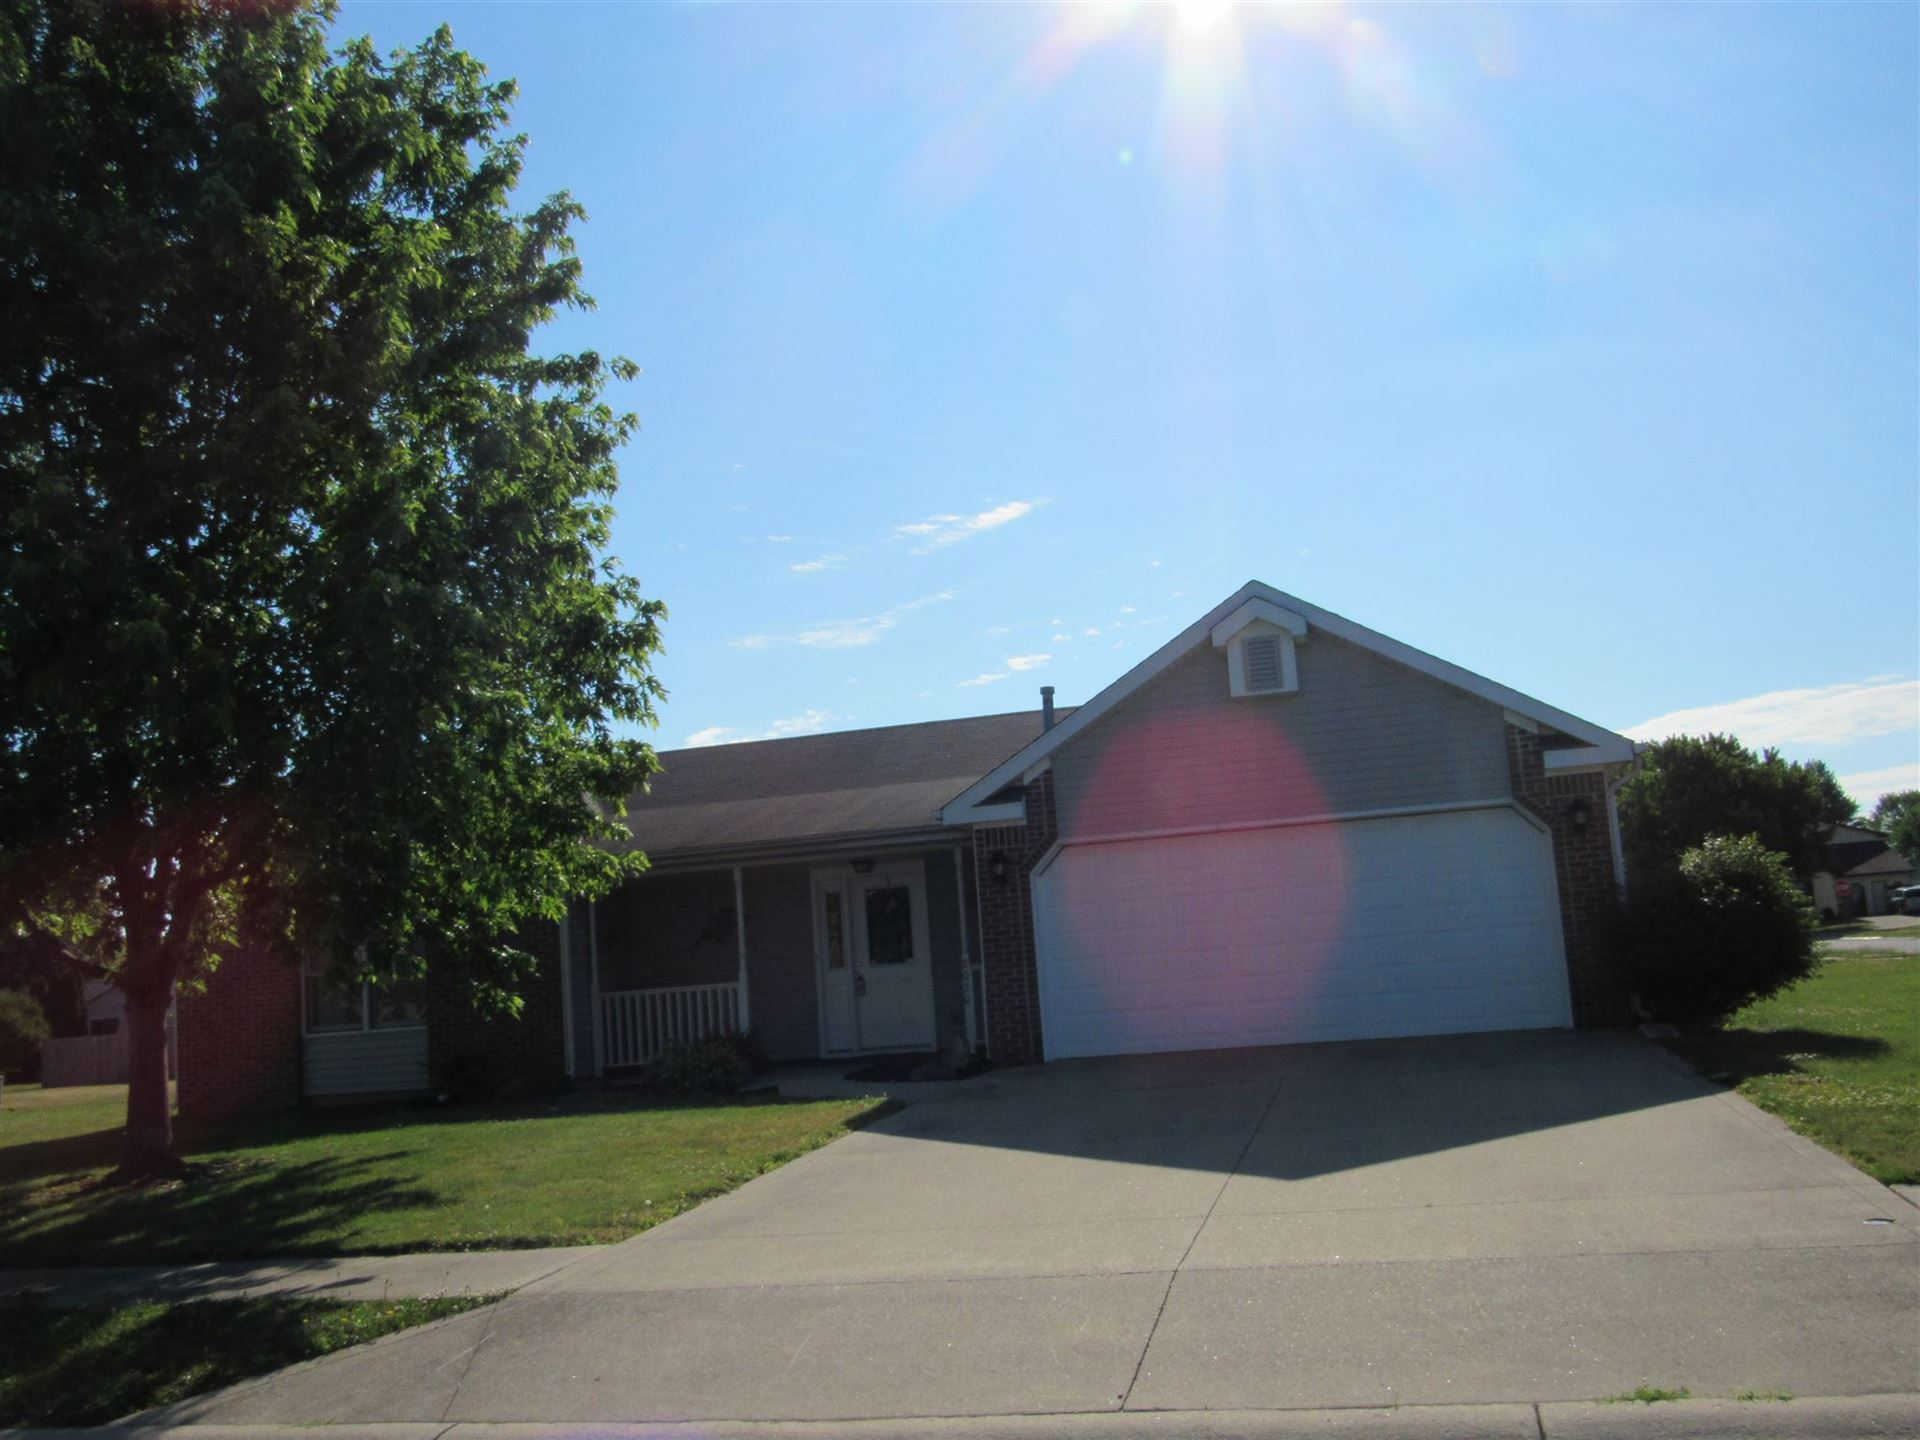 2020 Willow Bend Street, Huntington, IN 46750 - MLS#: 202001607